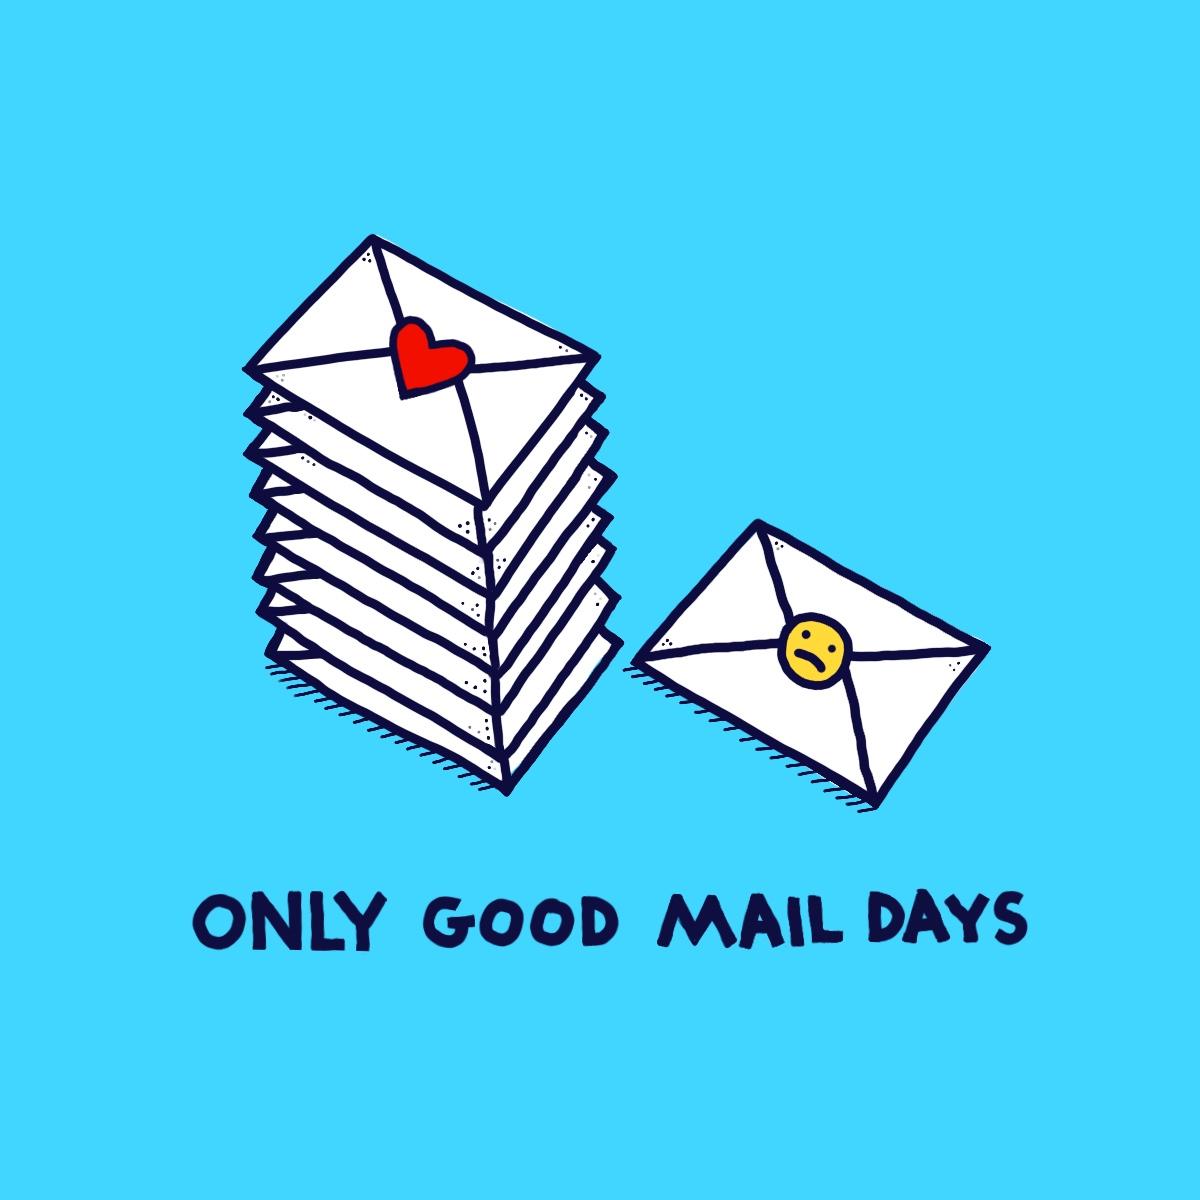 GraemeZirk_EditorialIllustration_Good Mail.jpg